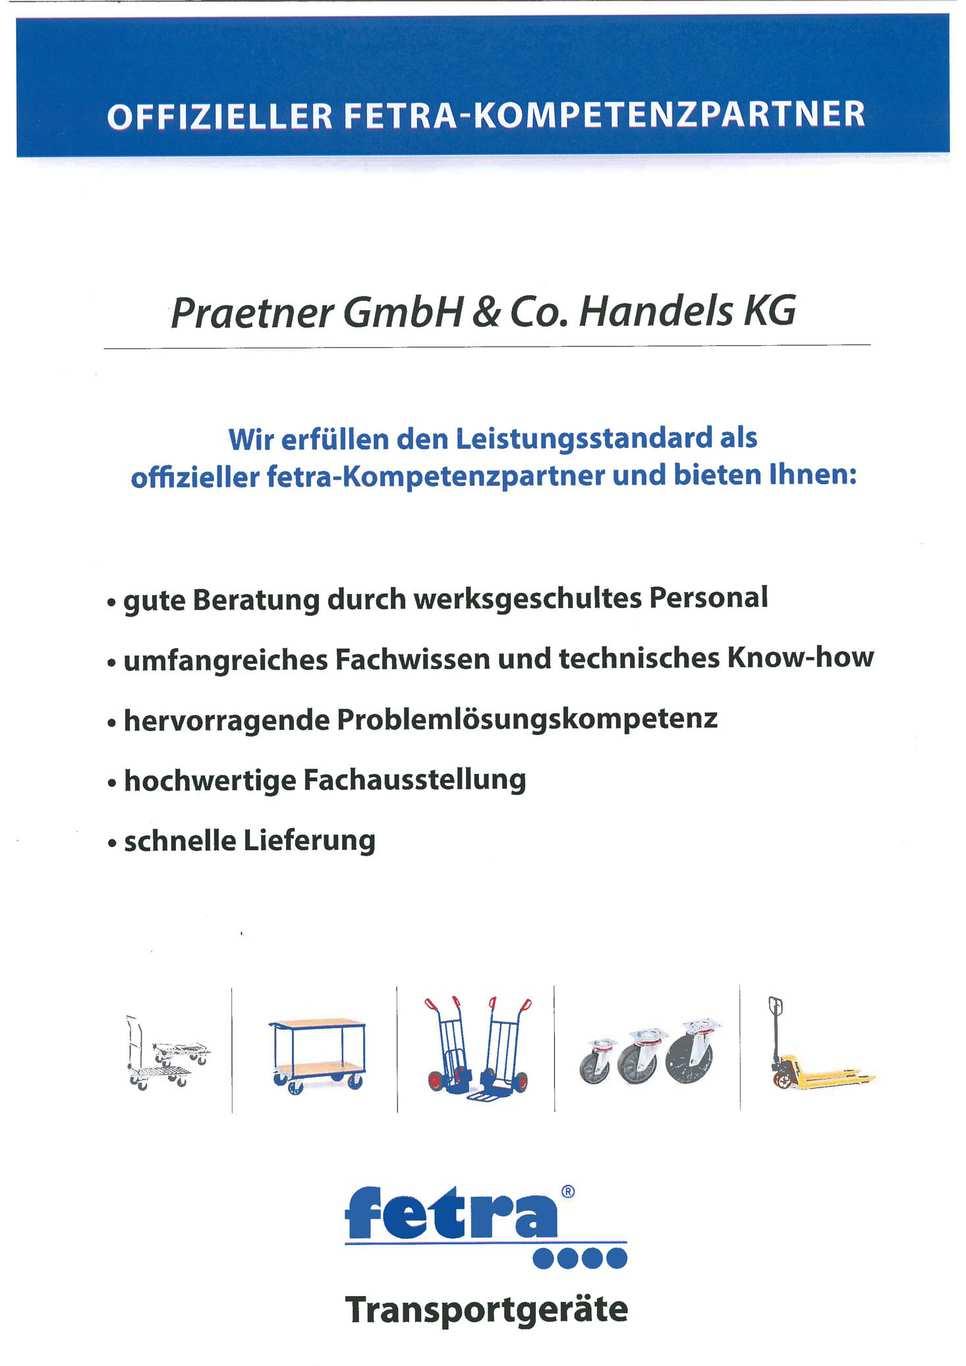 Fetra Transportgerät Zertifikat Kompetenzpartner